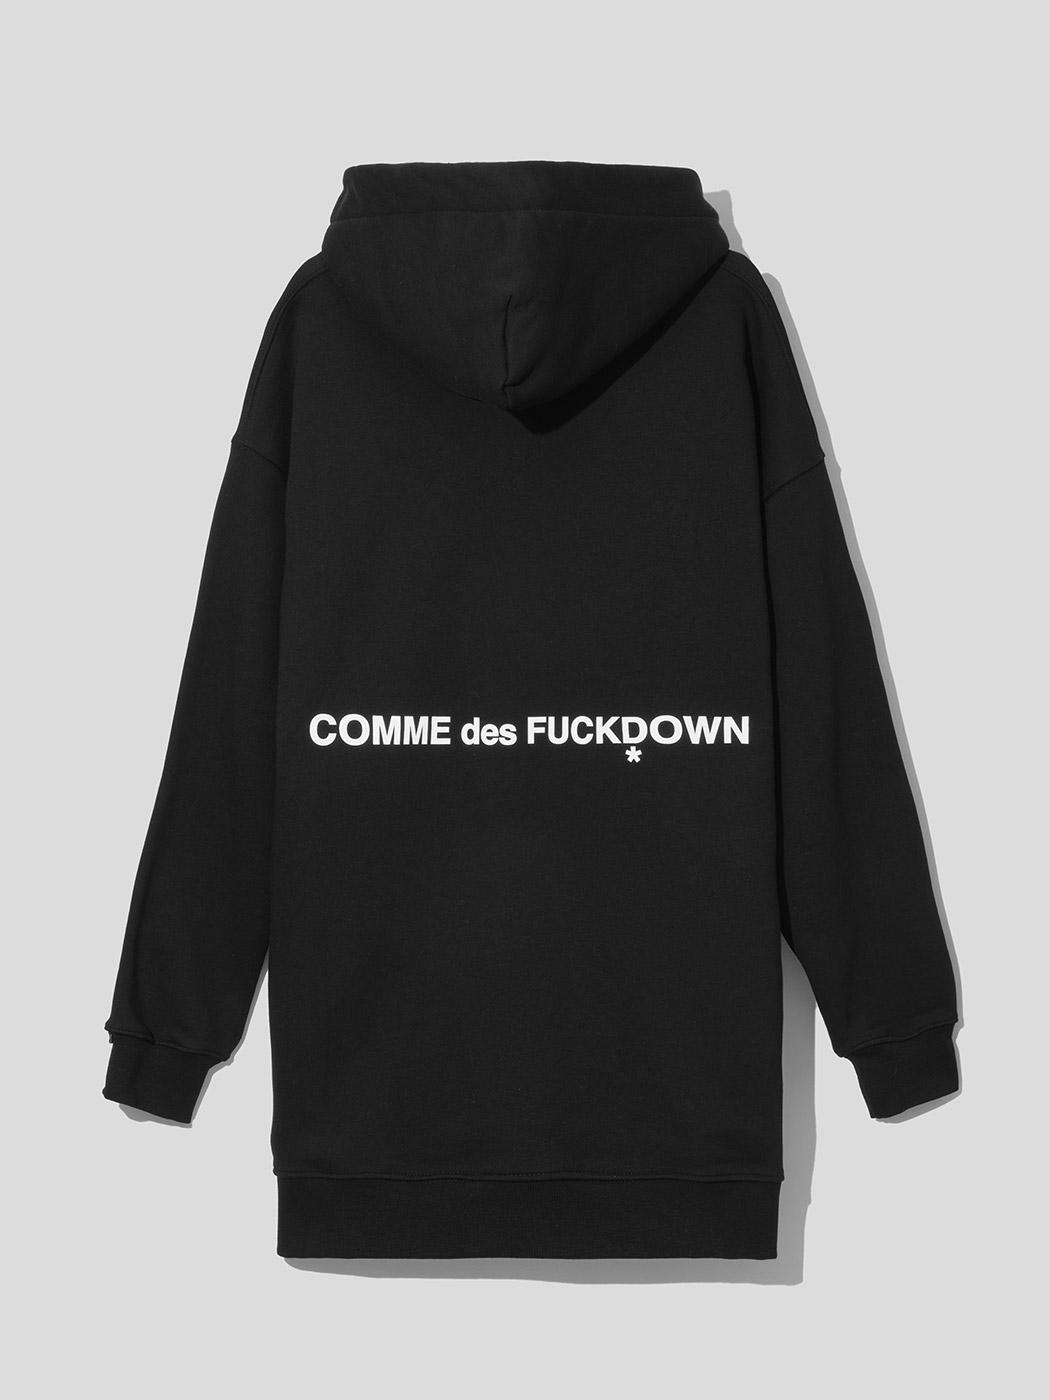 SWEATSHIRT - CDFD1548 - COMME DES FKDOWN